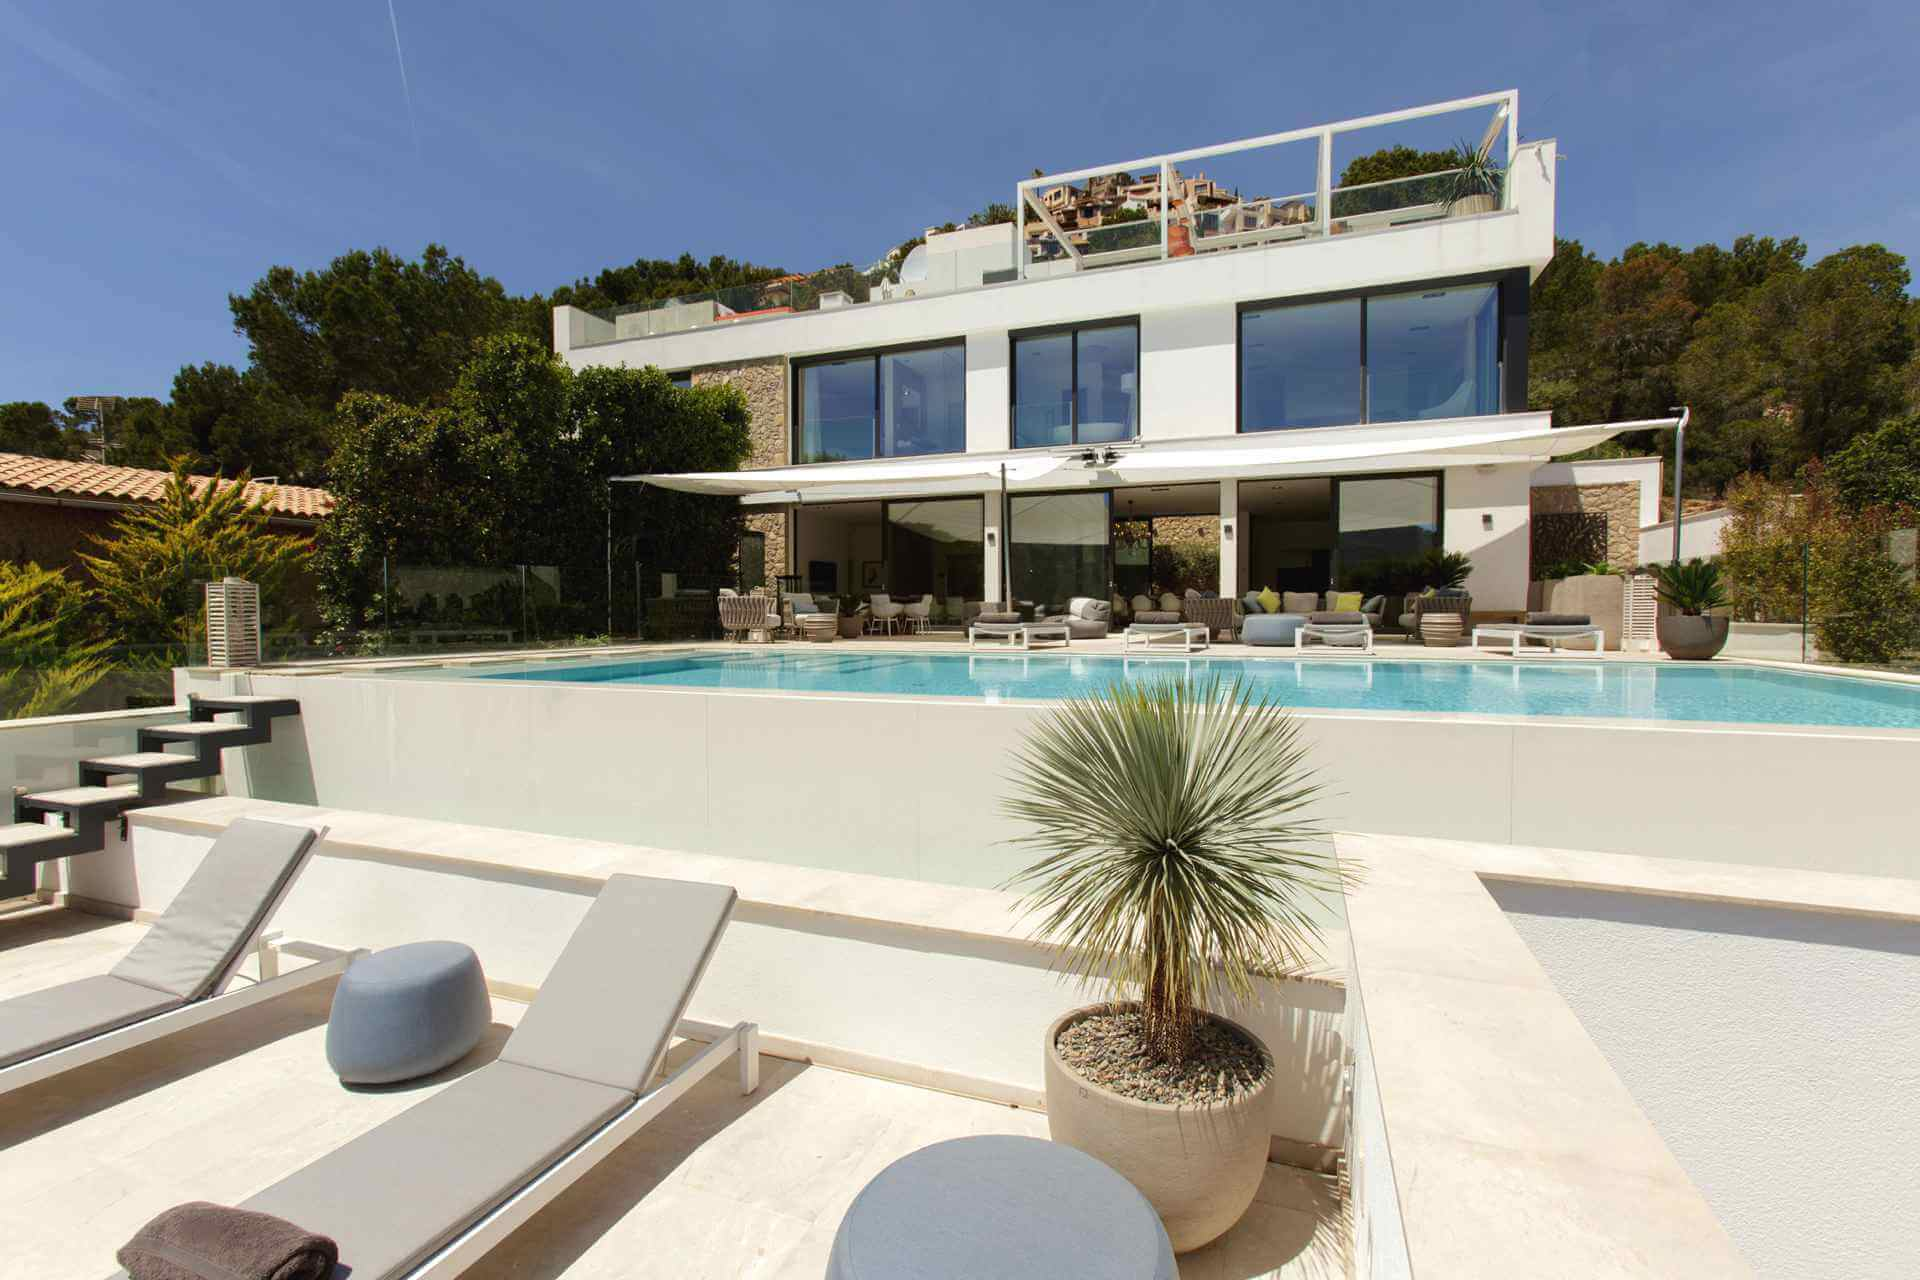 01-353 Villa with indoor pool Mallorca Southwest Bild 2